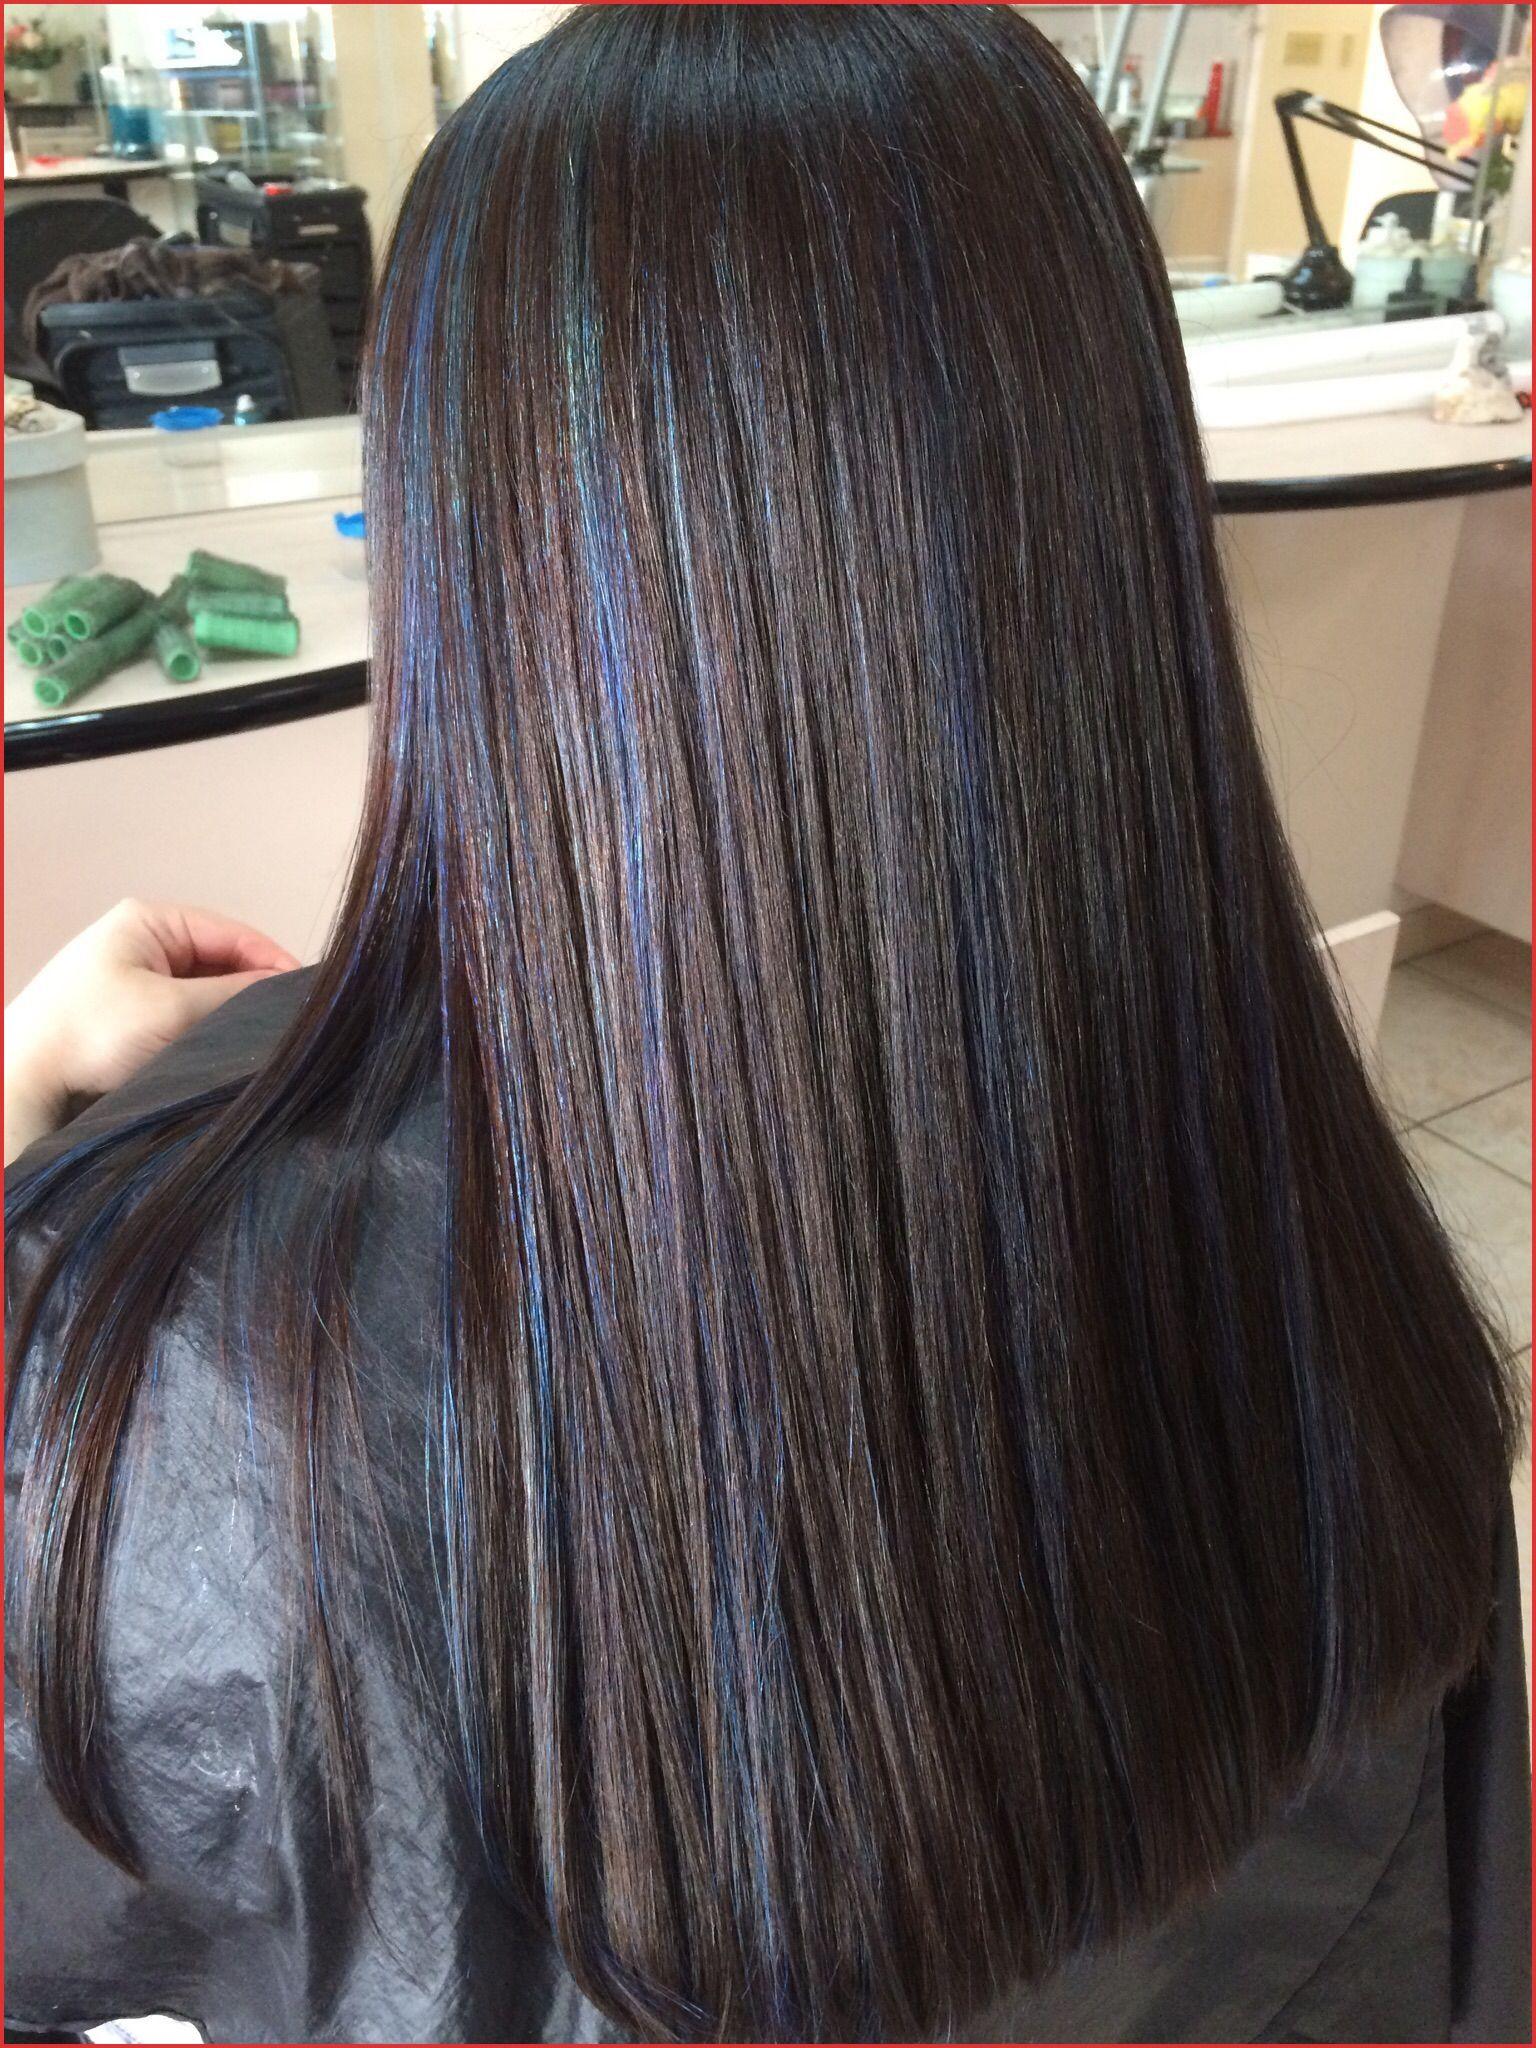 Black Hair With Blue Underneath Black Hair With Blue Underneath 136795 Dark Brown Hair With Blu Blue Hair Highlights Brown Hair Blue Highlights Blue Brown Hair